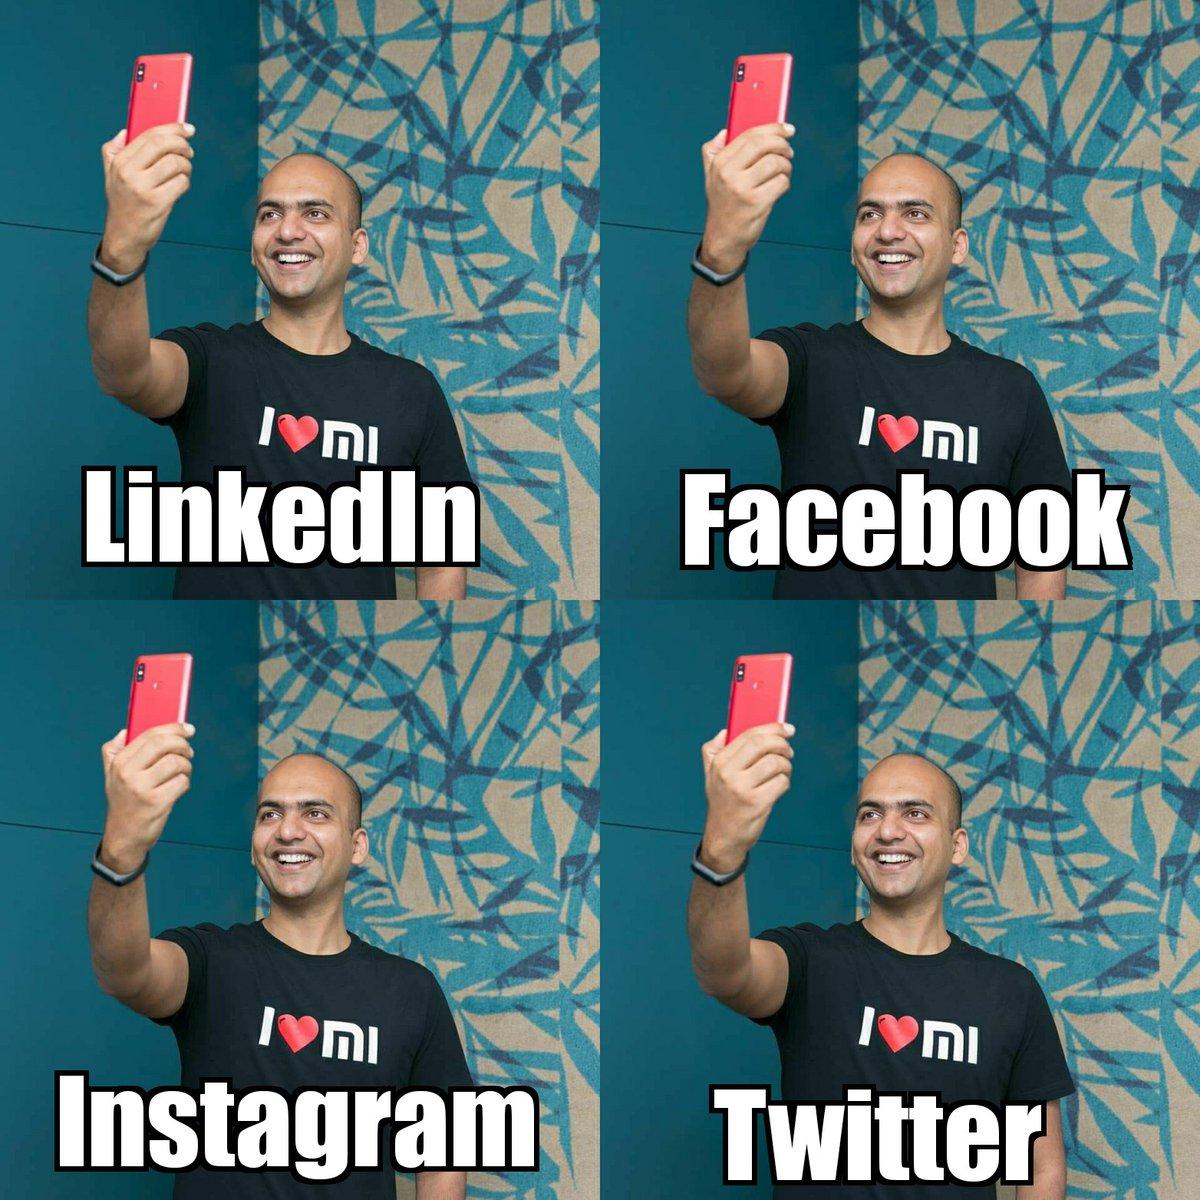 RT @manukumarjain: #DollyPartonChallenge!  I'm the same everywhere. Selfies and Xiaomi 😍 LOL 😎  #Xiaomi ❤️ https://t.co/BihoIqDTdV